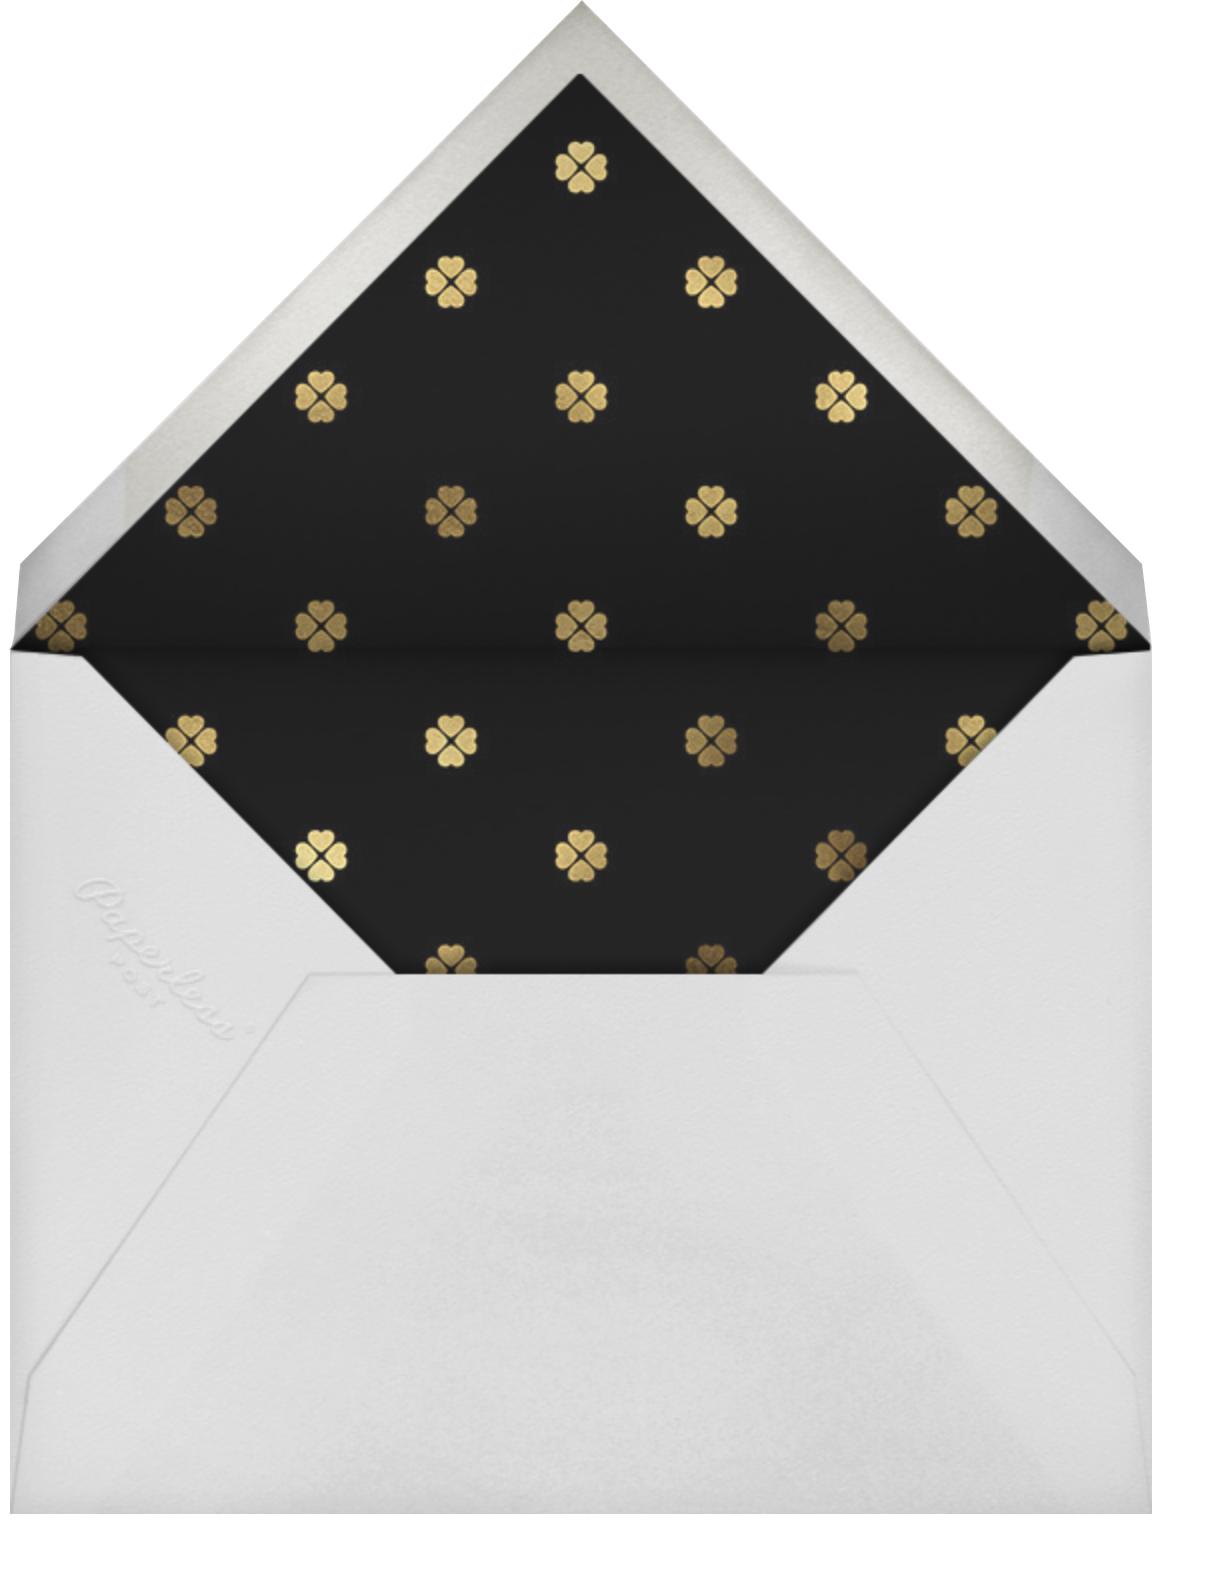 Colorblocked Border - Rose/Black - kate spade new york - Save the date - envelope back